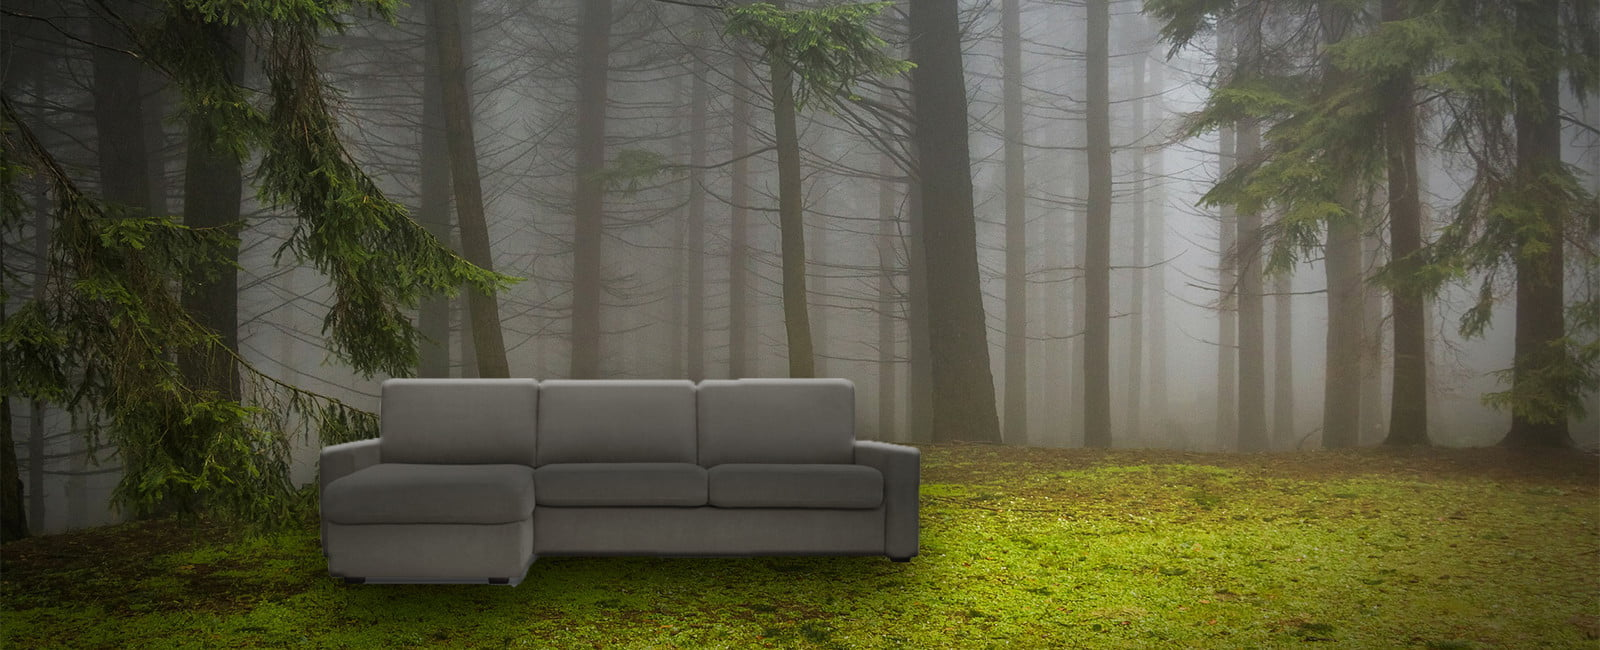 hilton divan